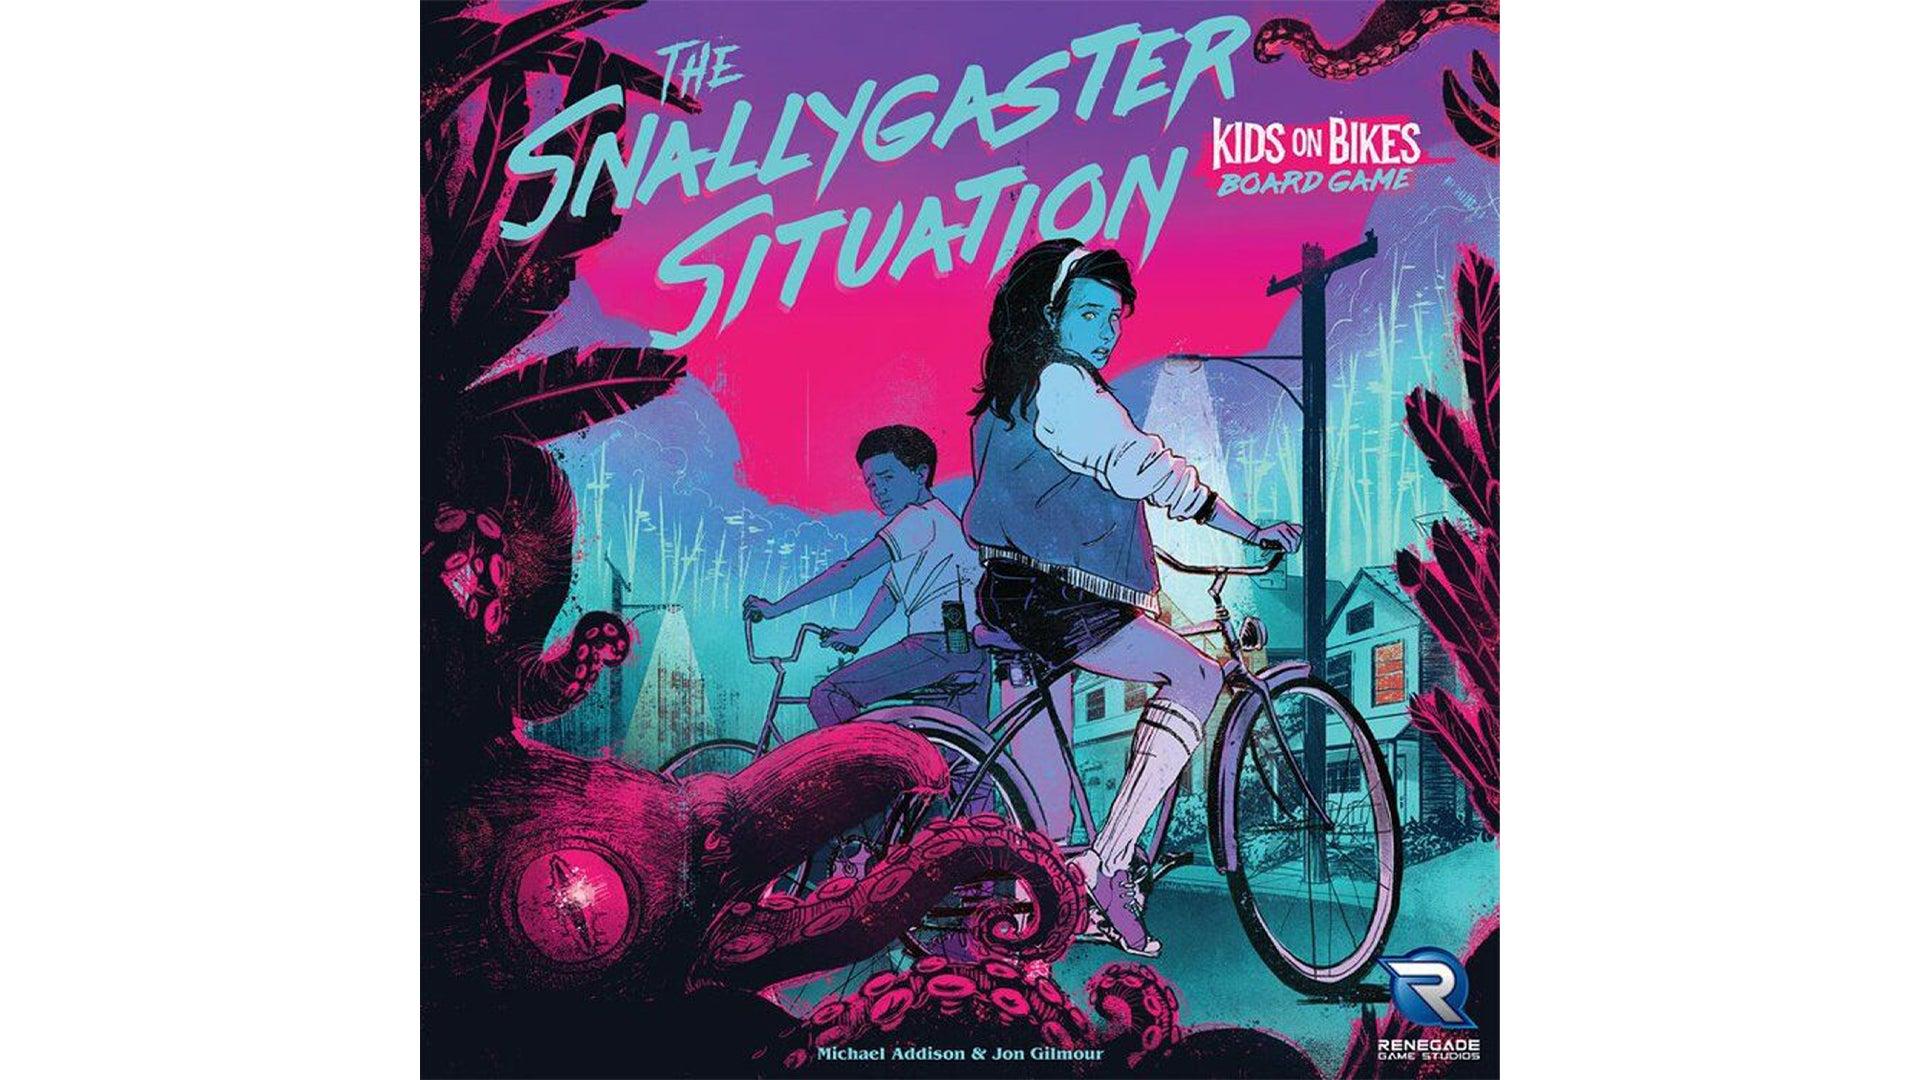 kids-on-bikes-snallygaster-situation-board-game-box-white-bg.jpg